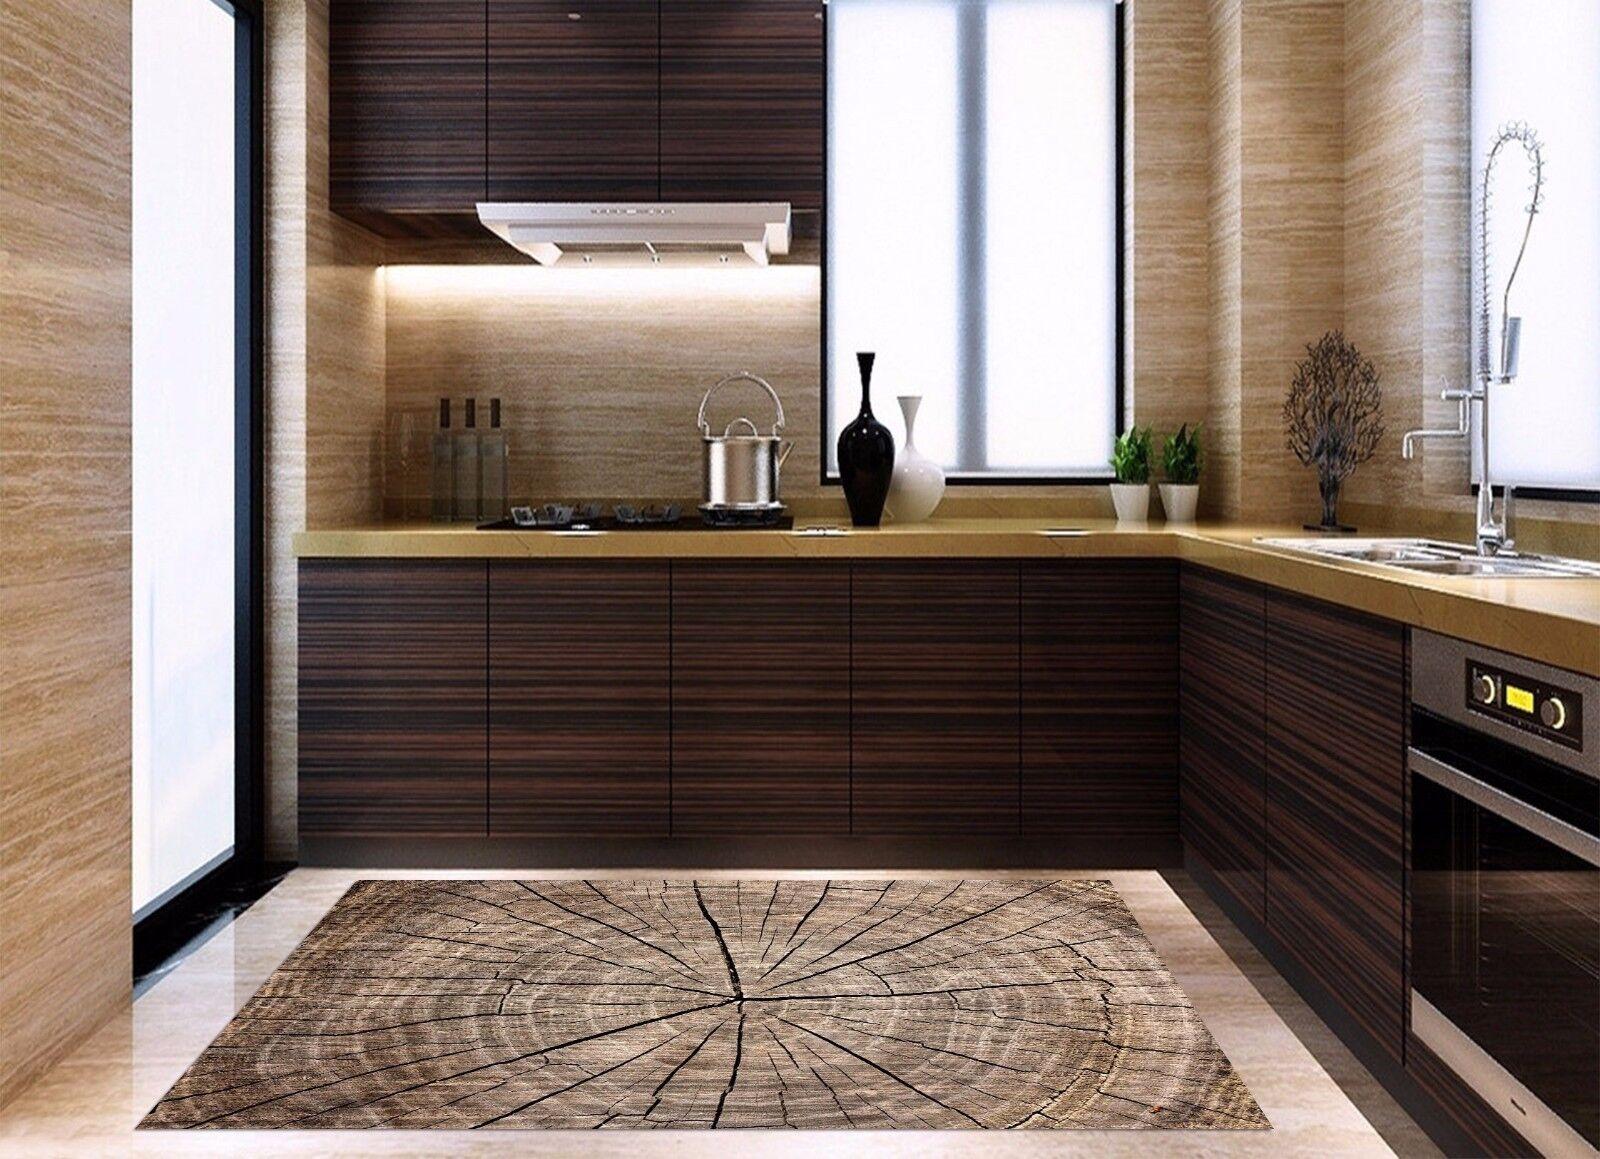 3D Wood Texture 62 Kitchen Mat Floor Murals Wall Print Wall AJ WALLPAPER UK Kyra